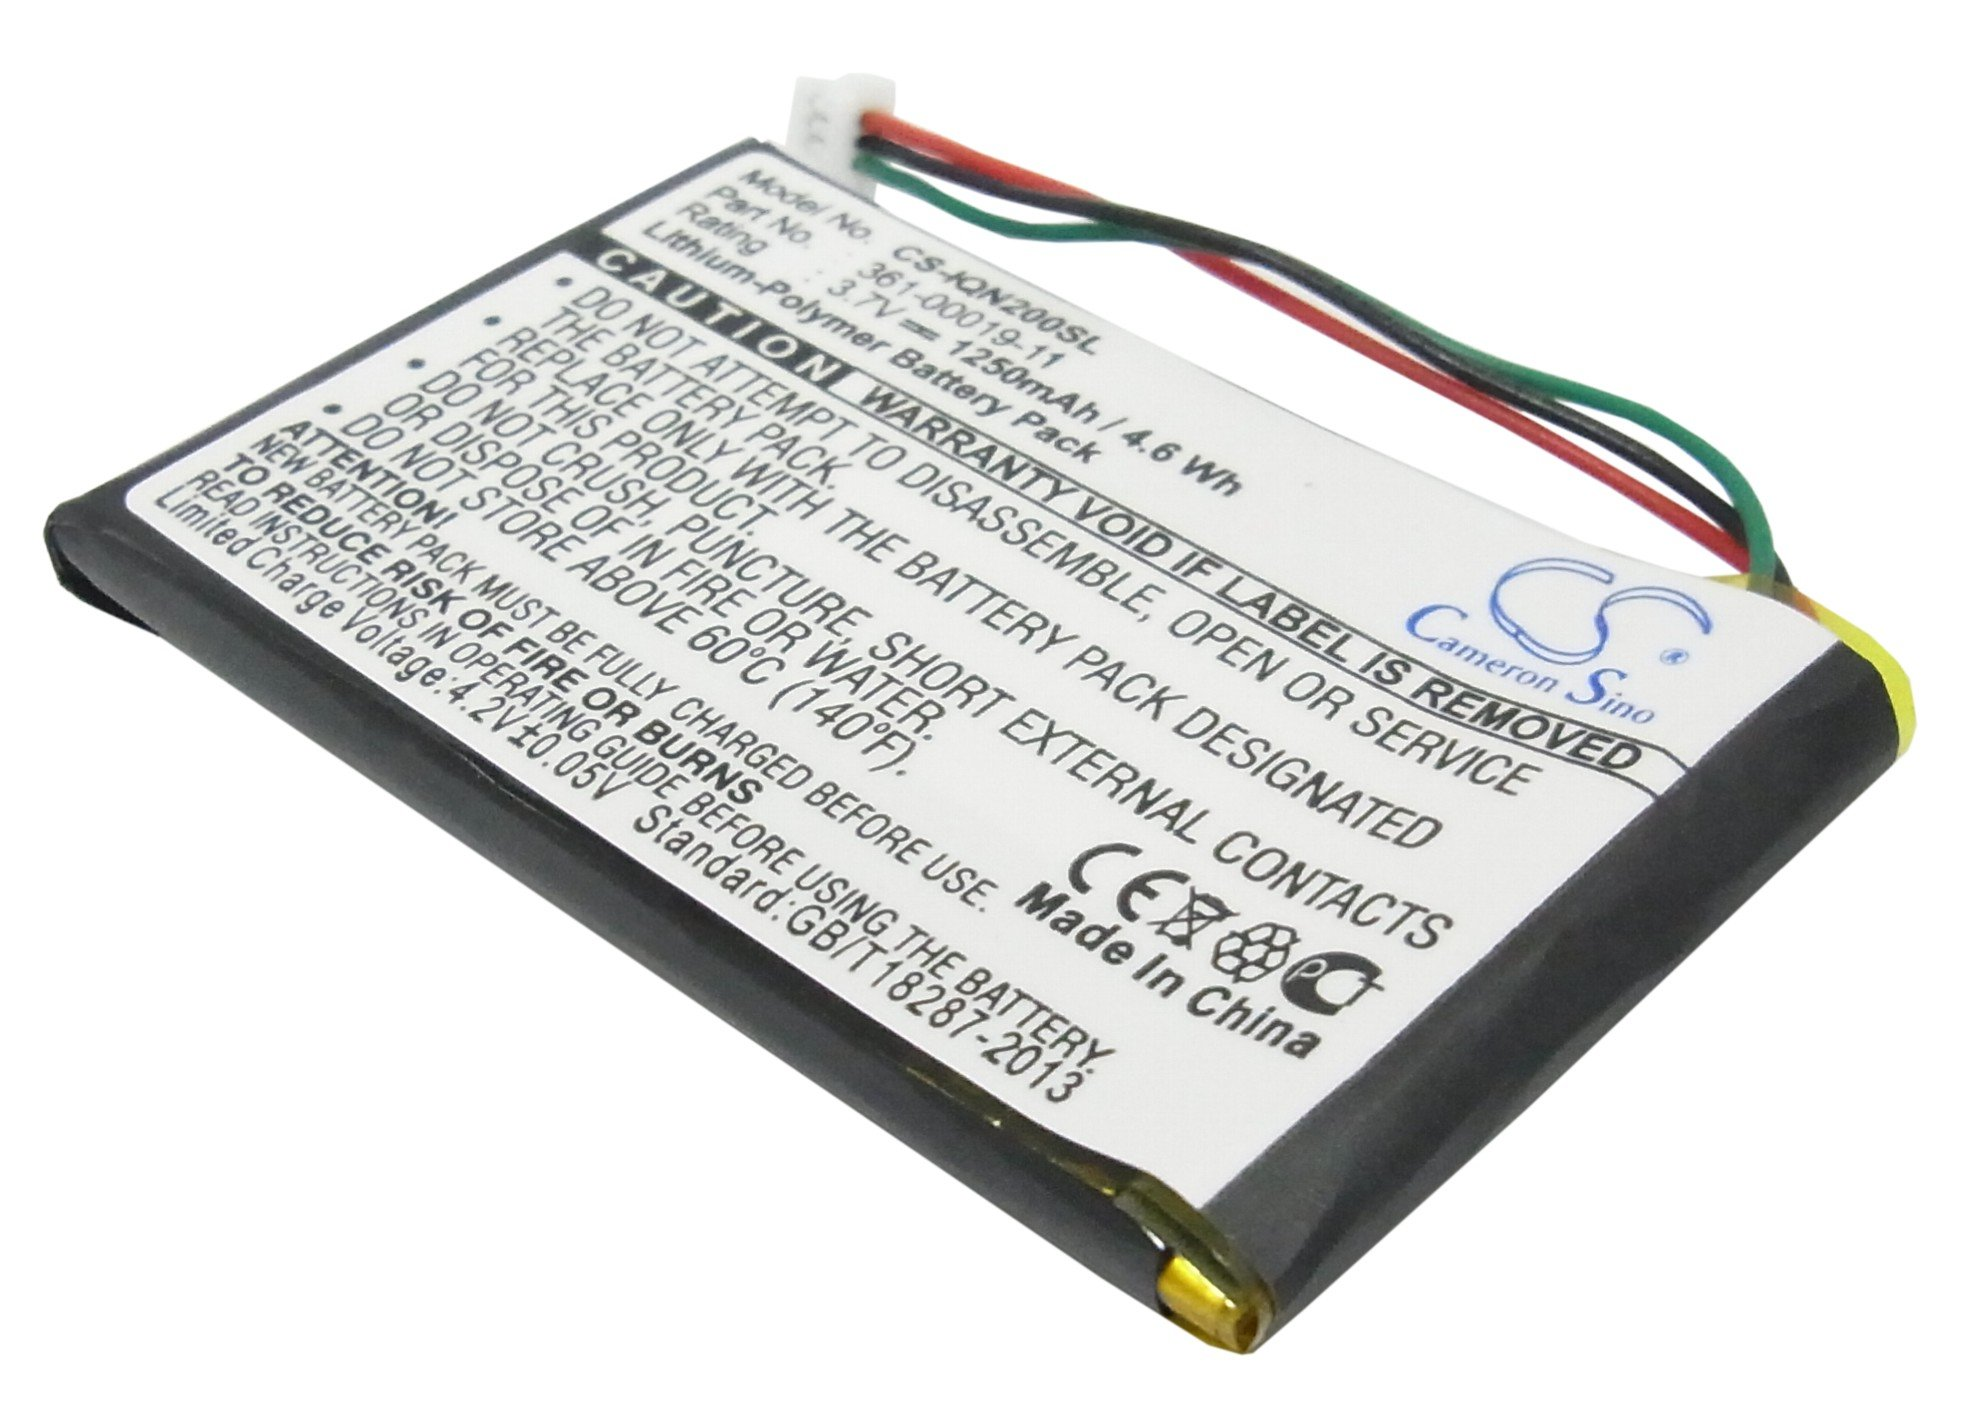 Cameron Sino Аккумулятор для GPS-навигатора Garmin 361-00019-11, 010-00583-000 3,7V 1250mAh код 008.01004